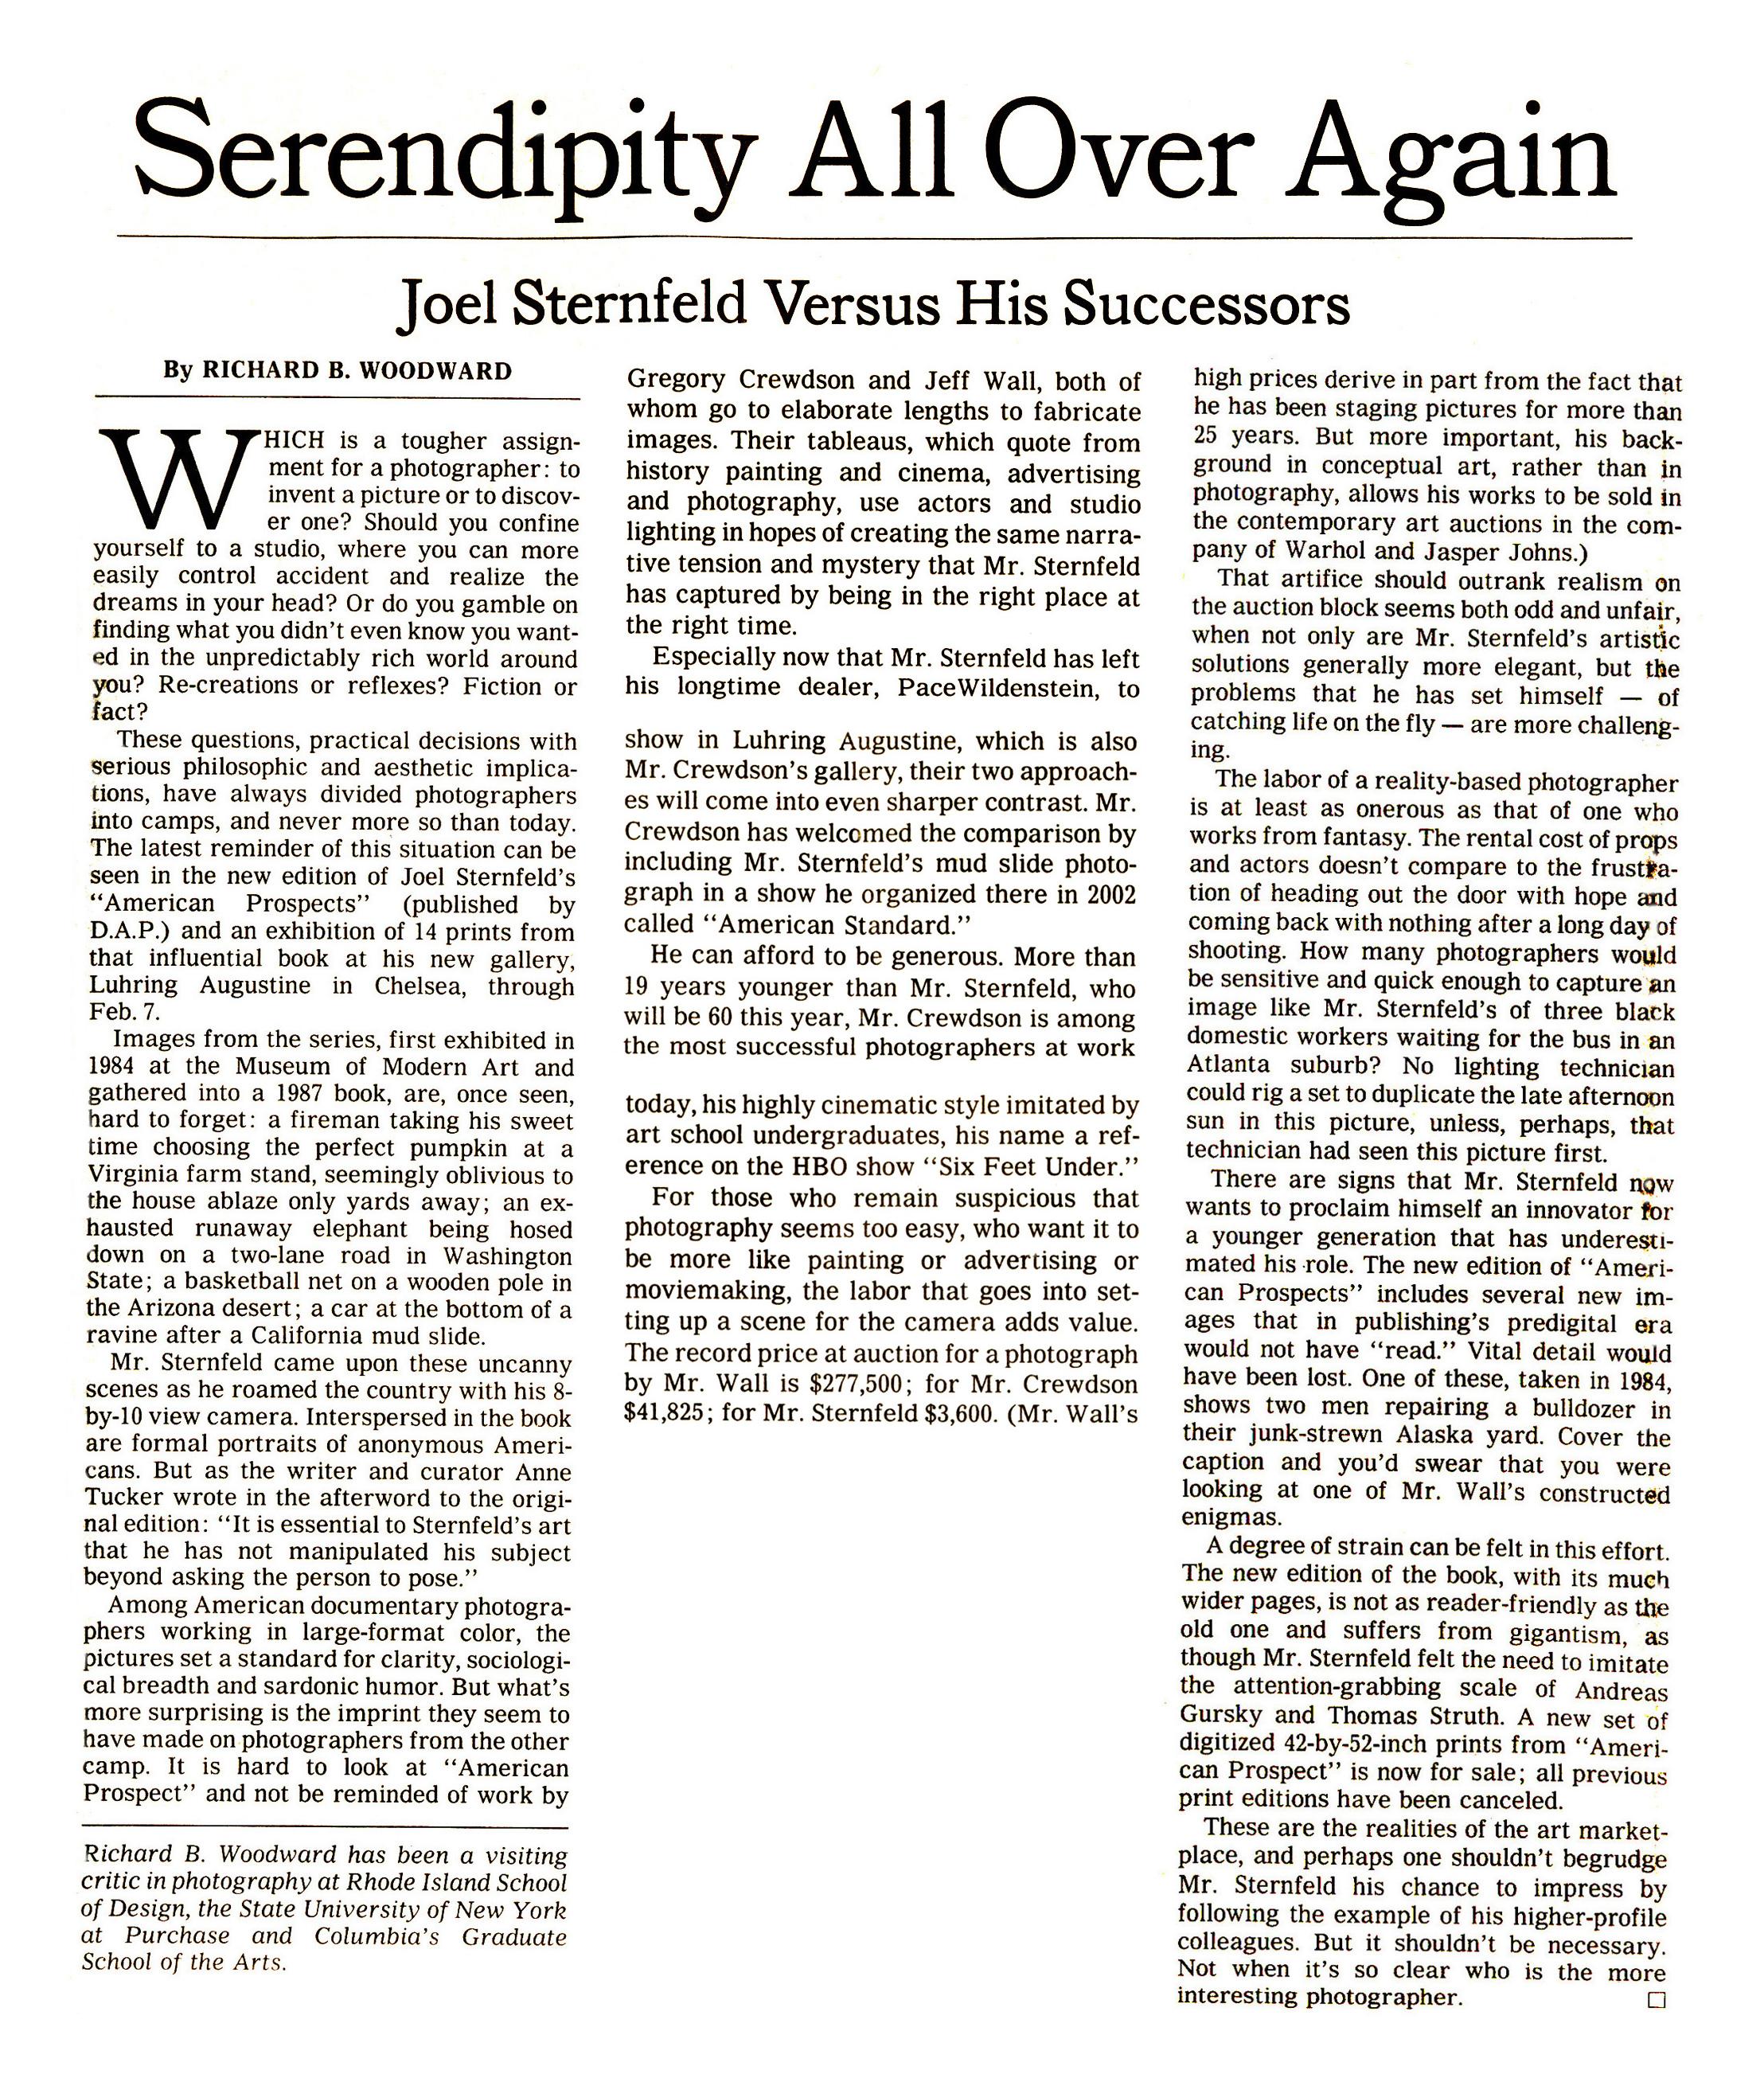 20040118_The-New-York-Times.jpg